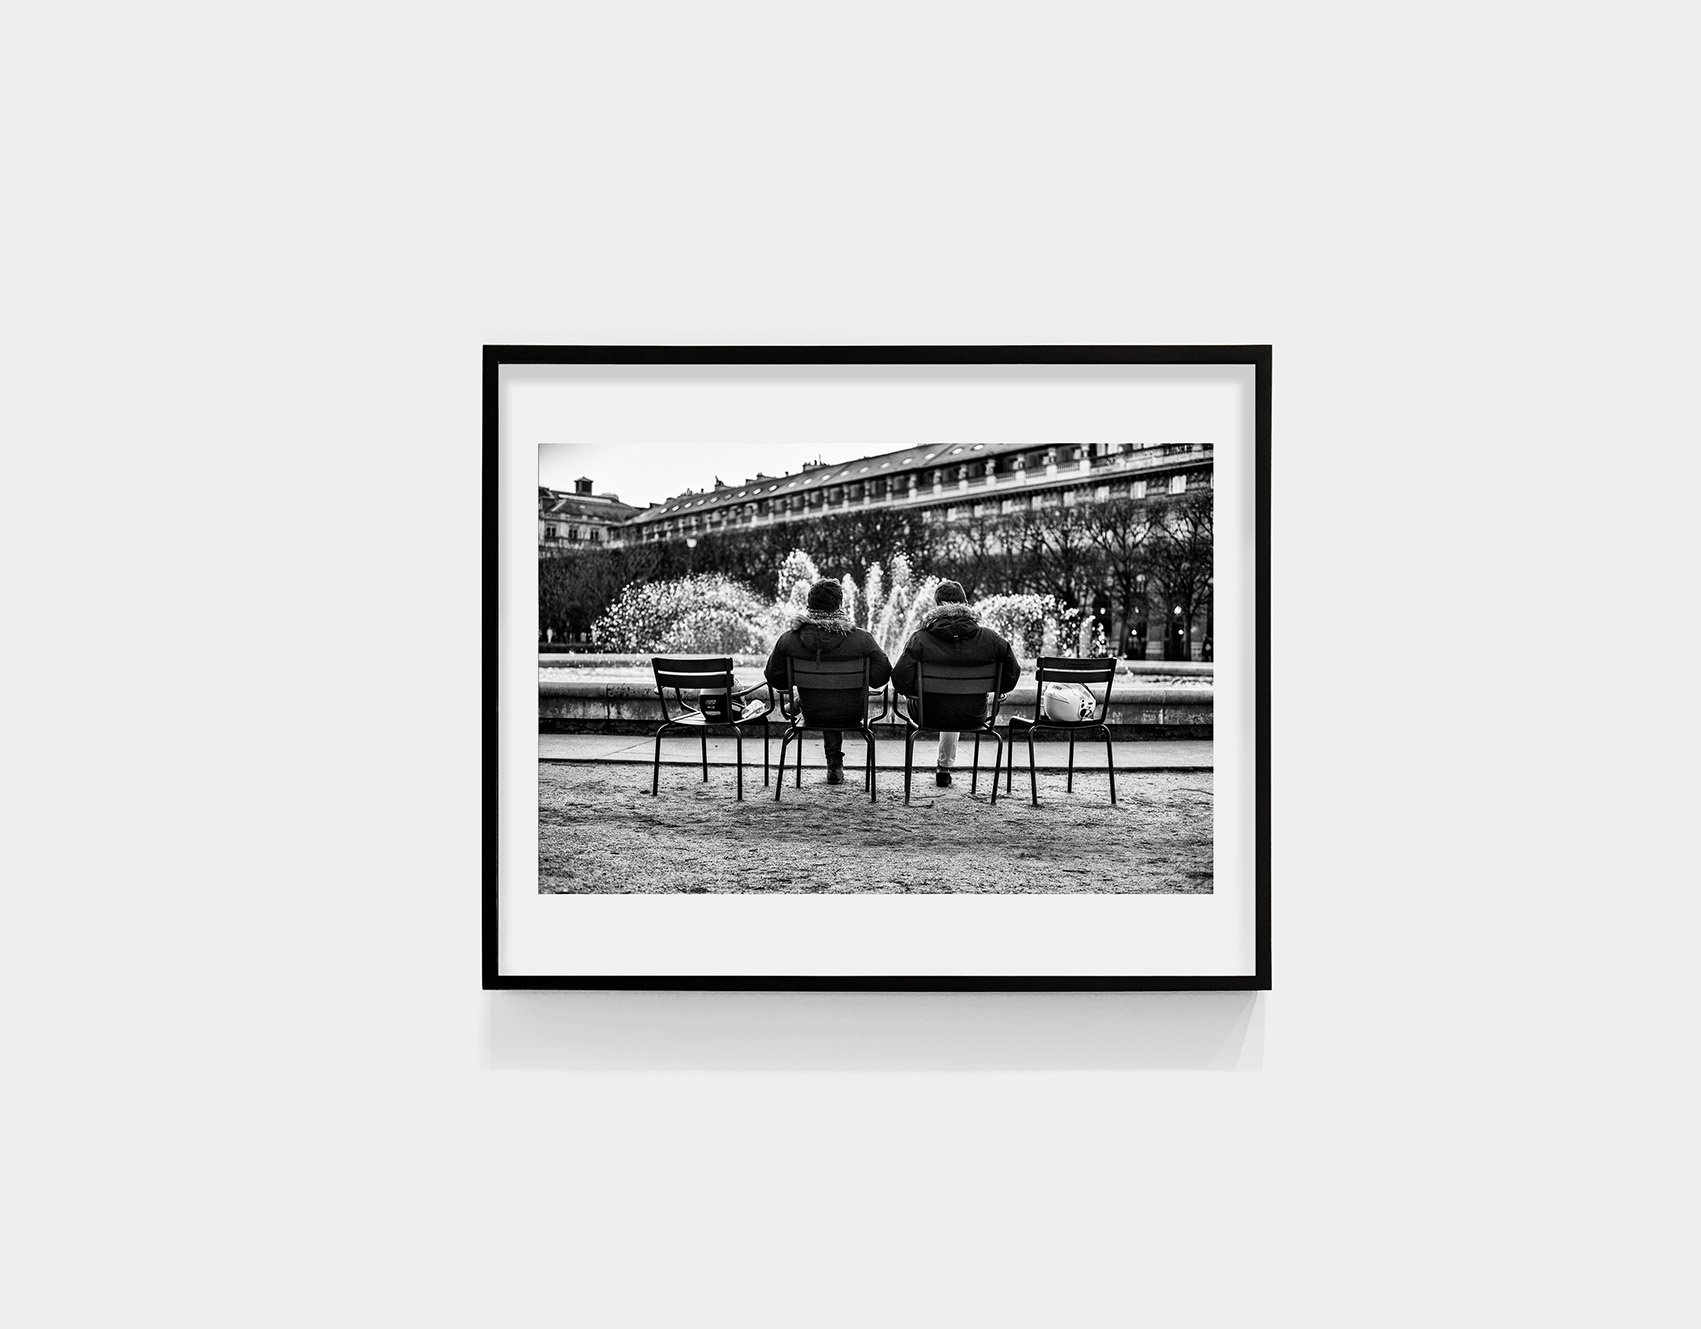 Tirage_Laurent_Delhourme_JardinPalaisRoyal